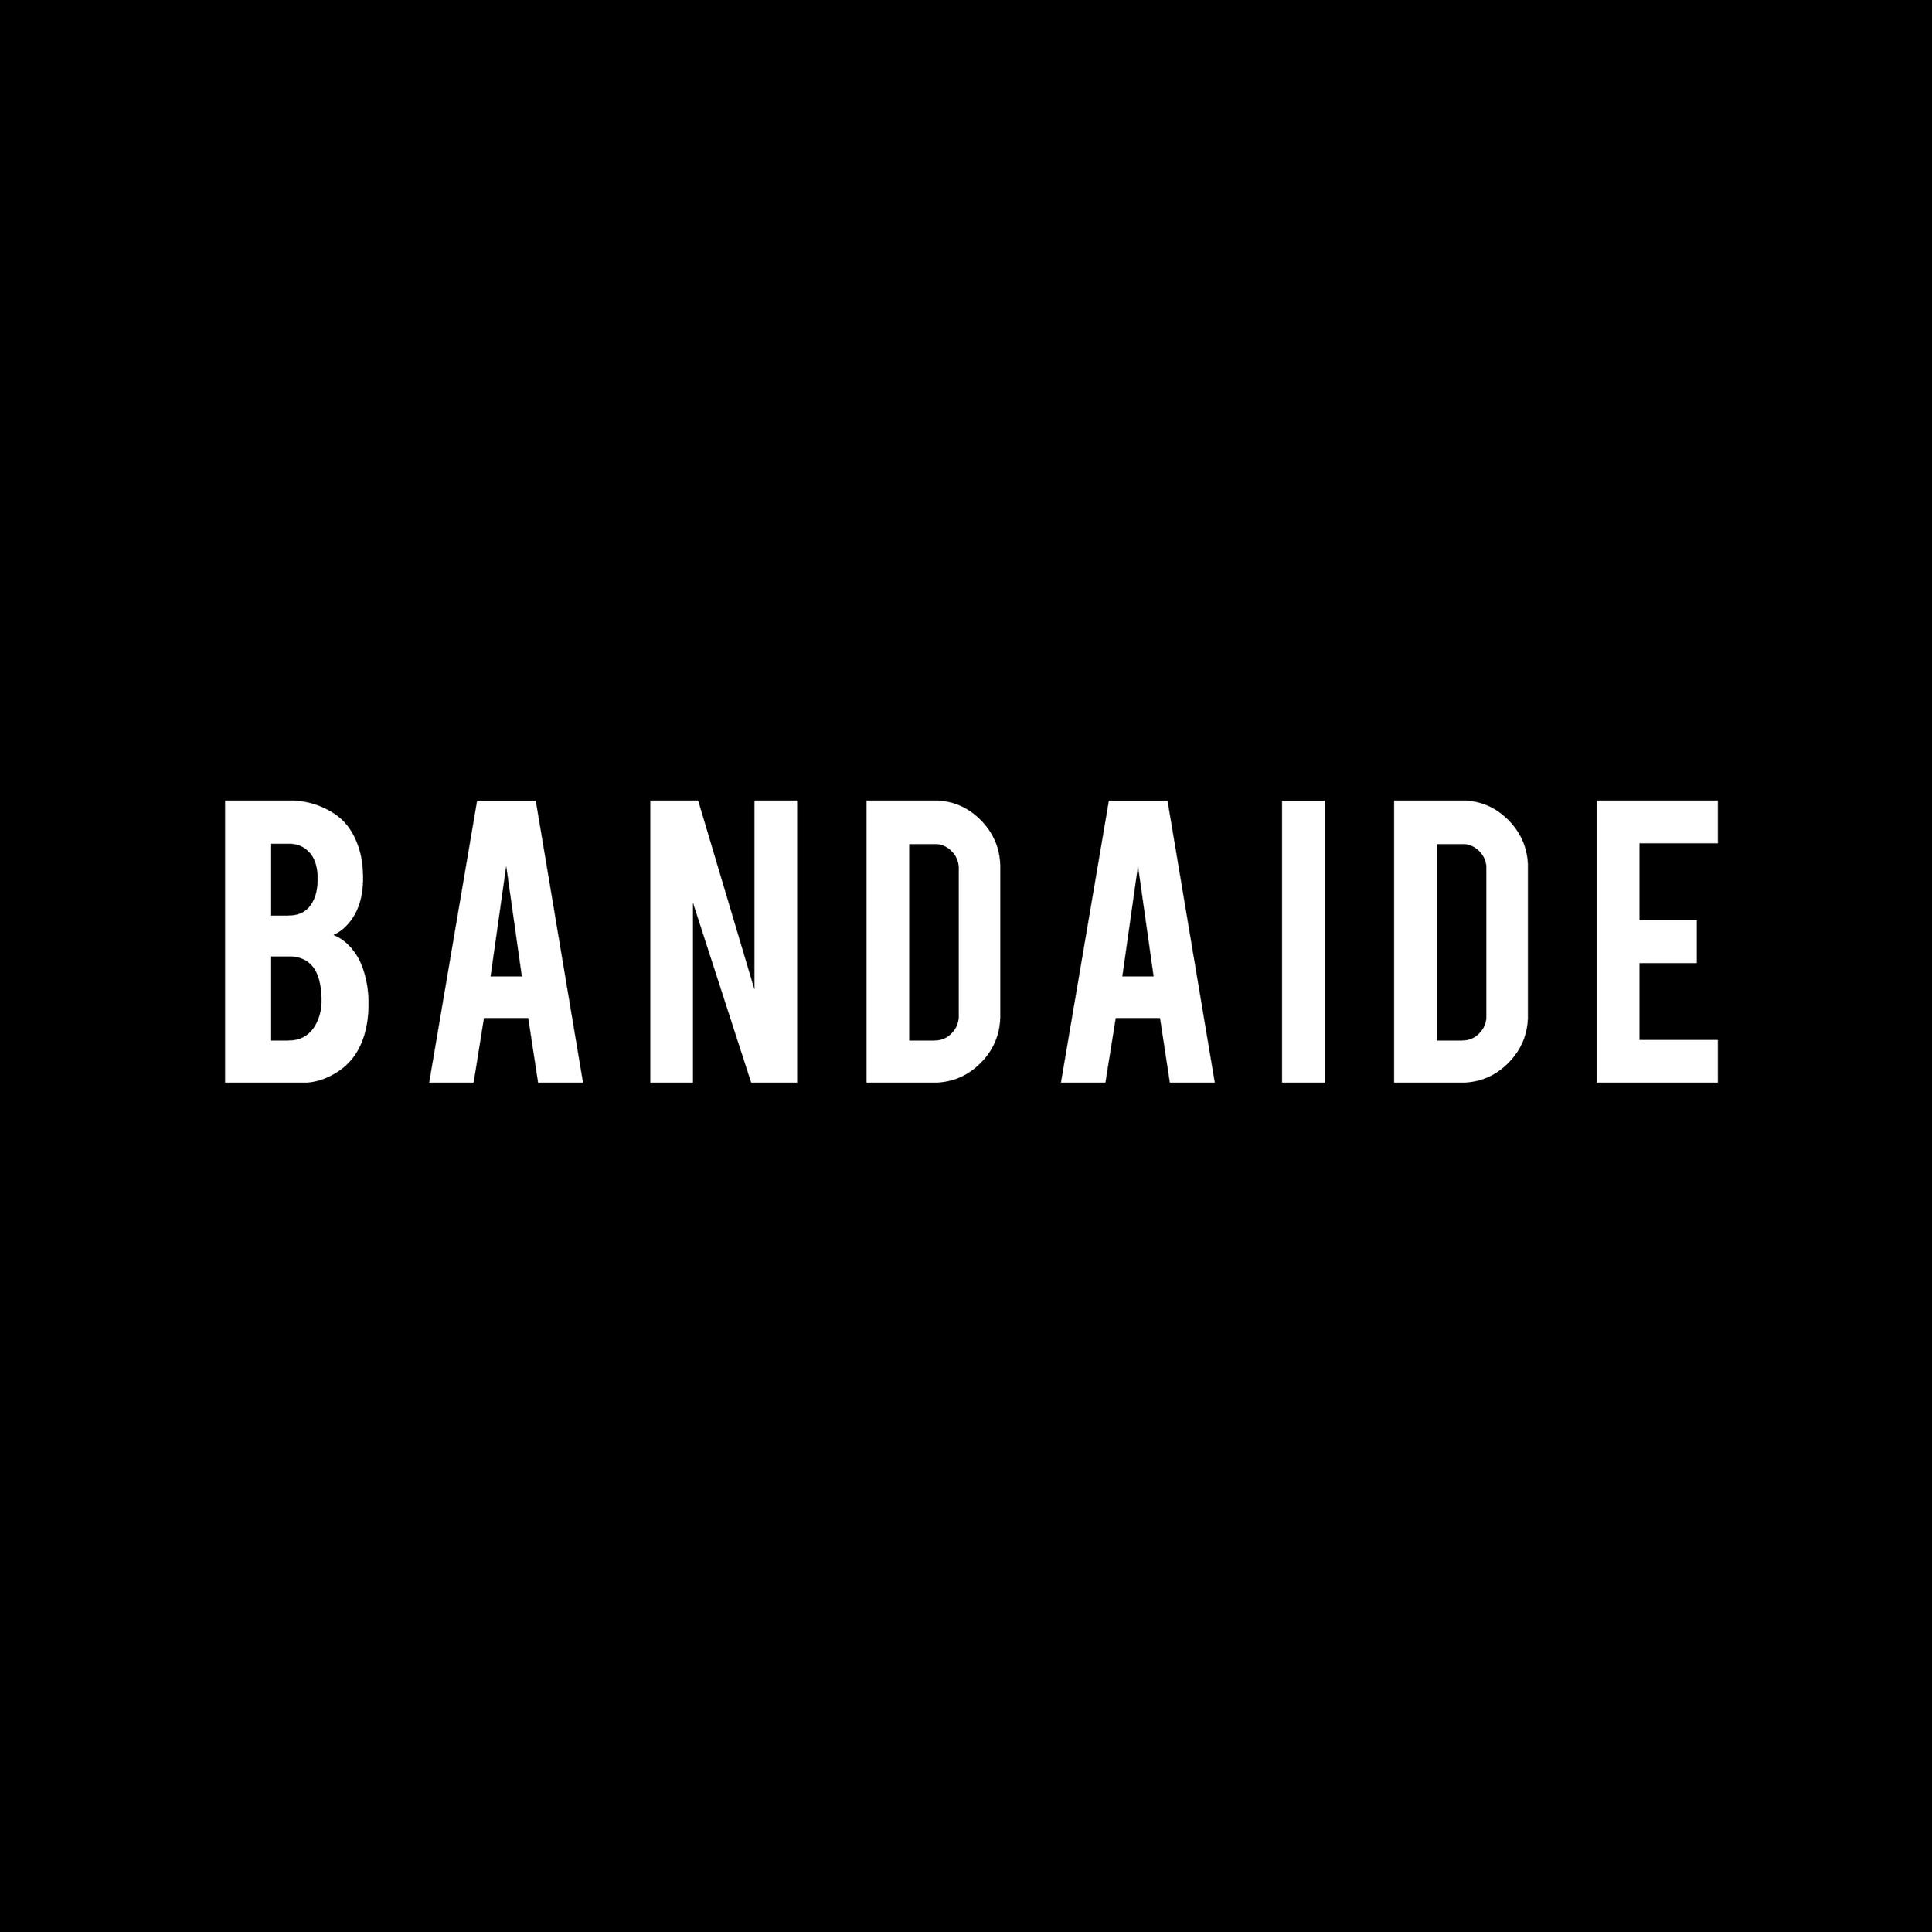 bandaide logo 4sq.jpg